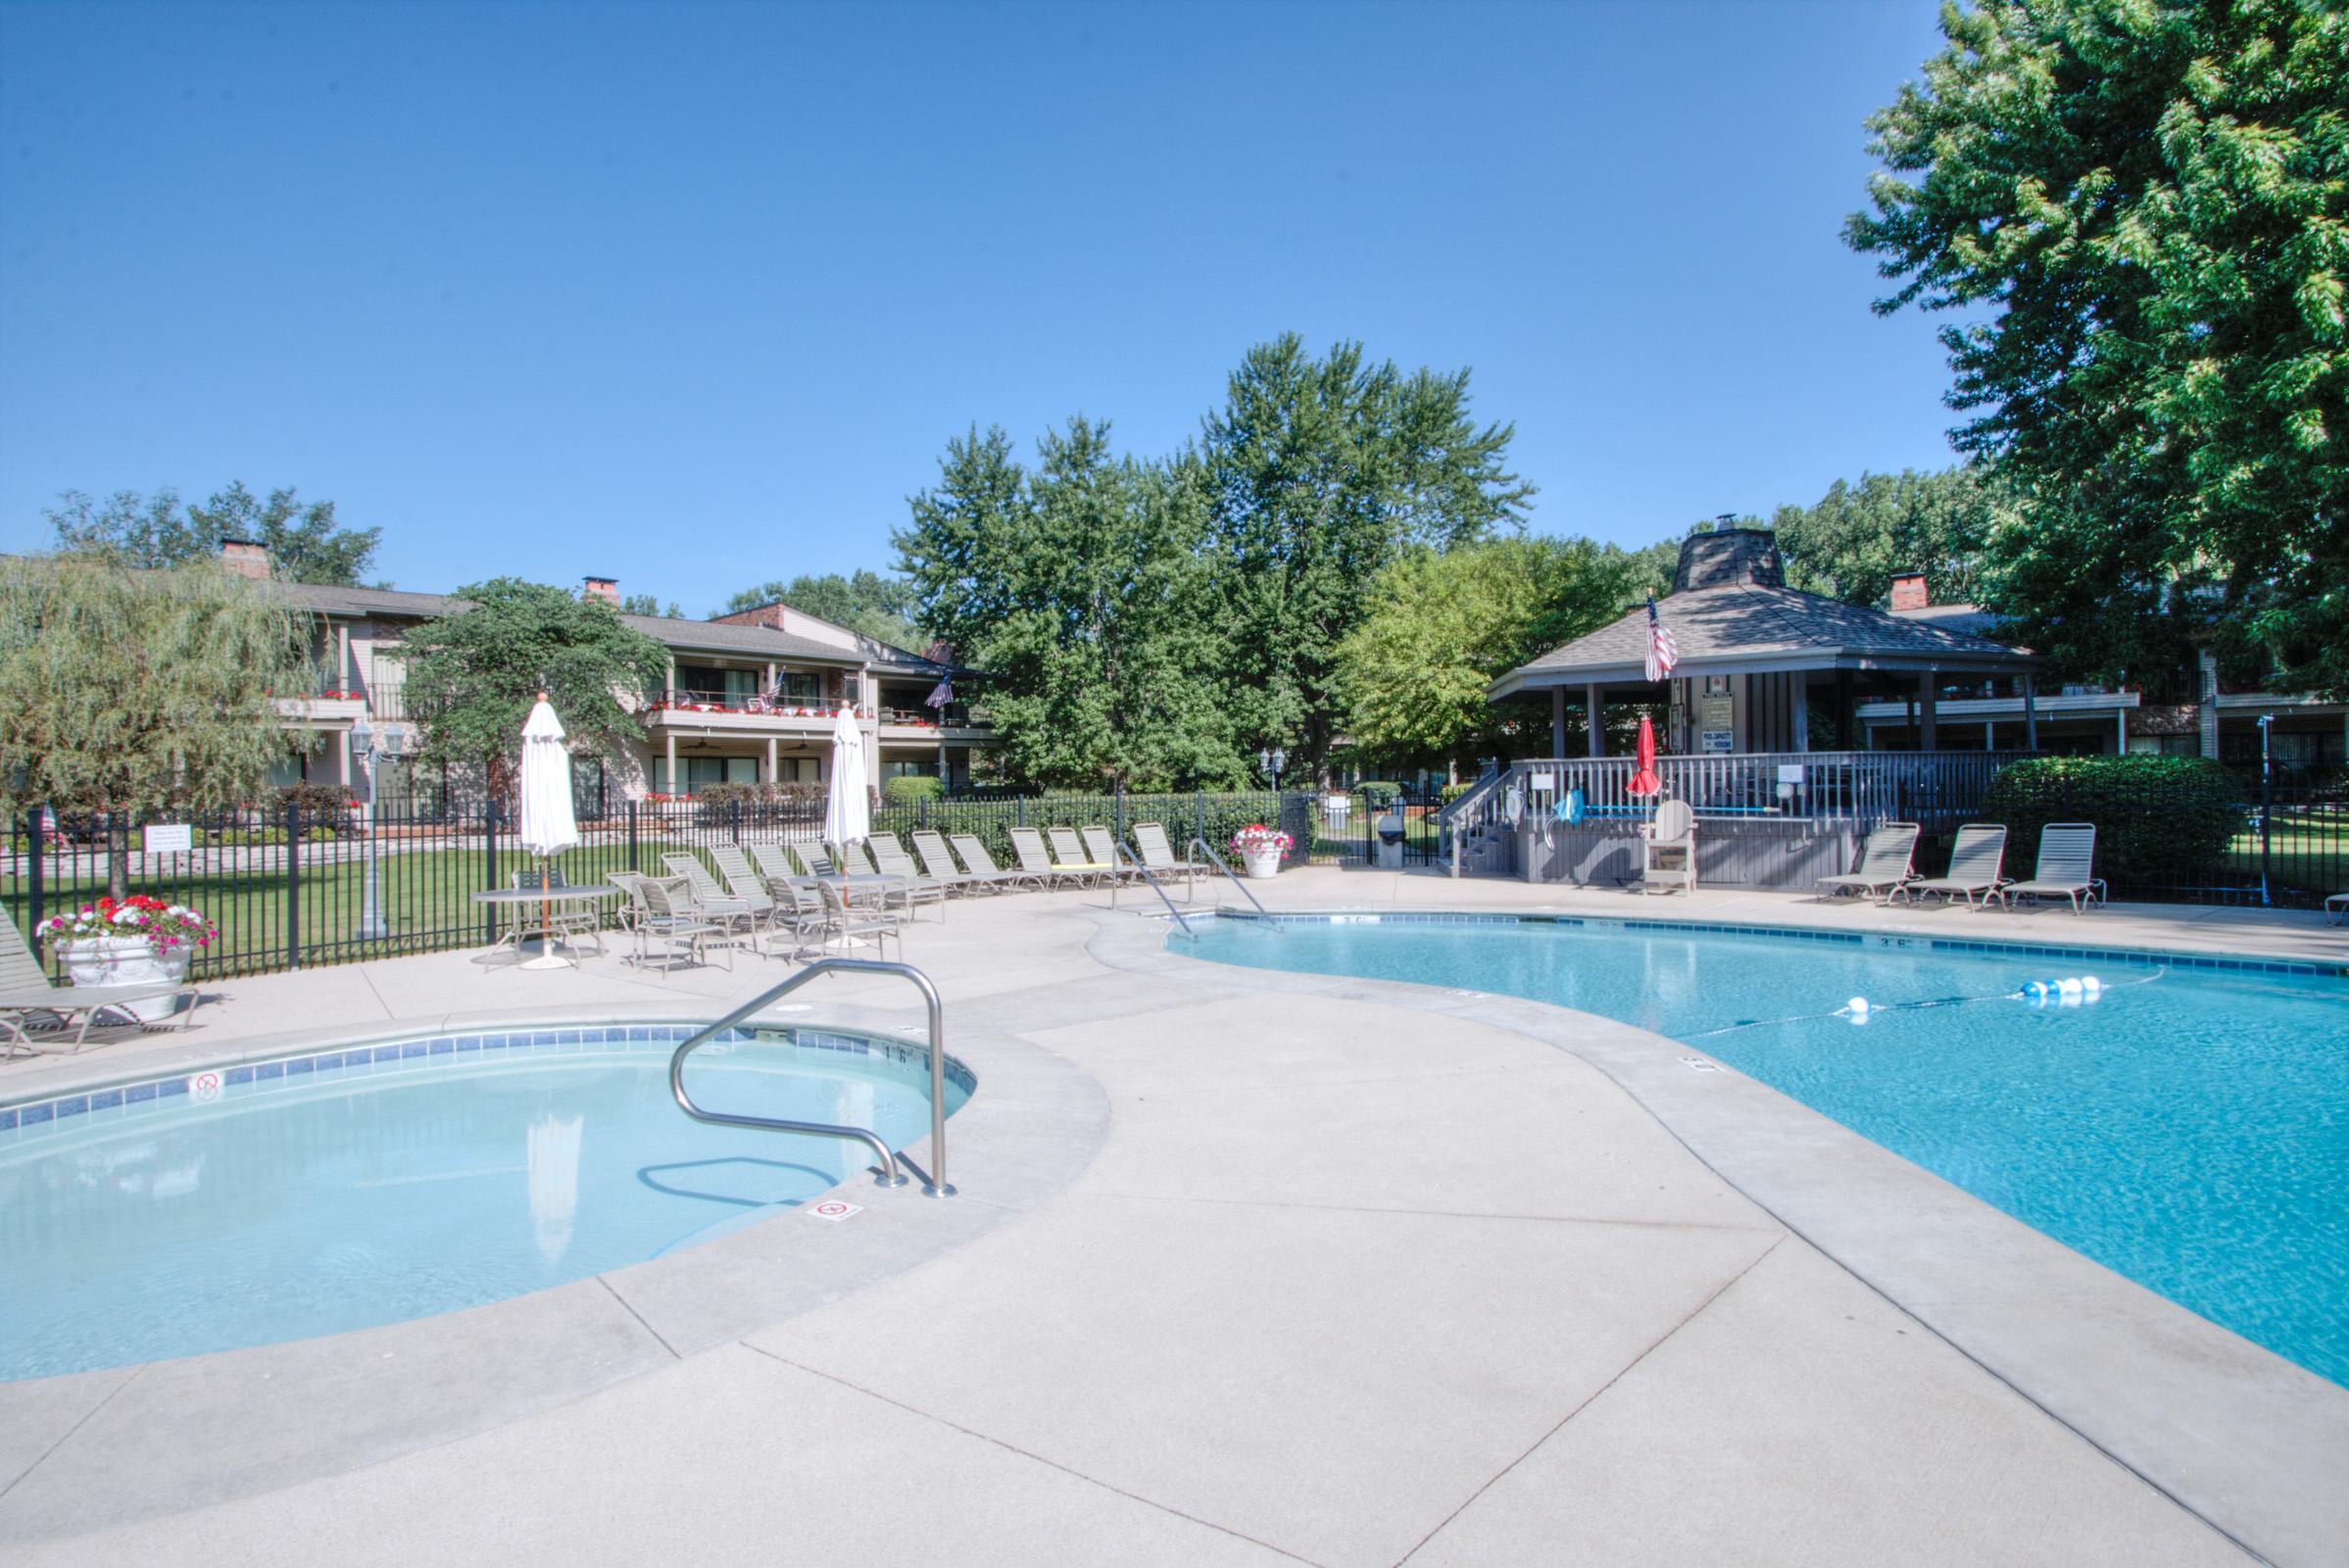 Outdoor Association Pool Pic 2.jpg